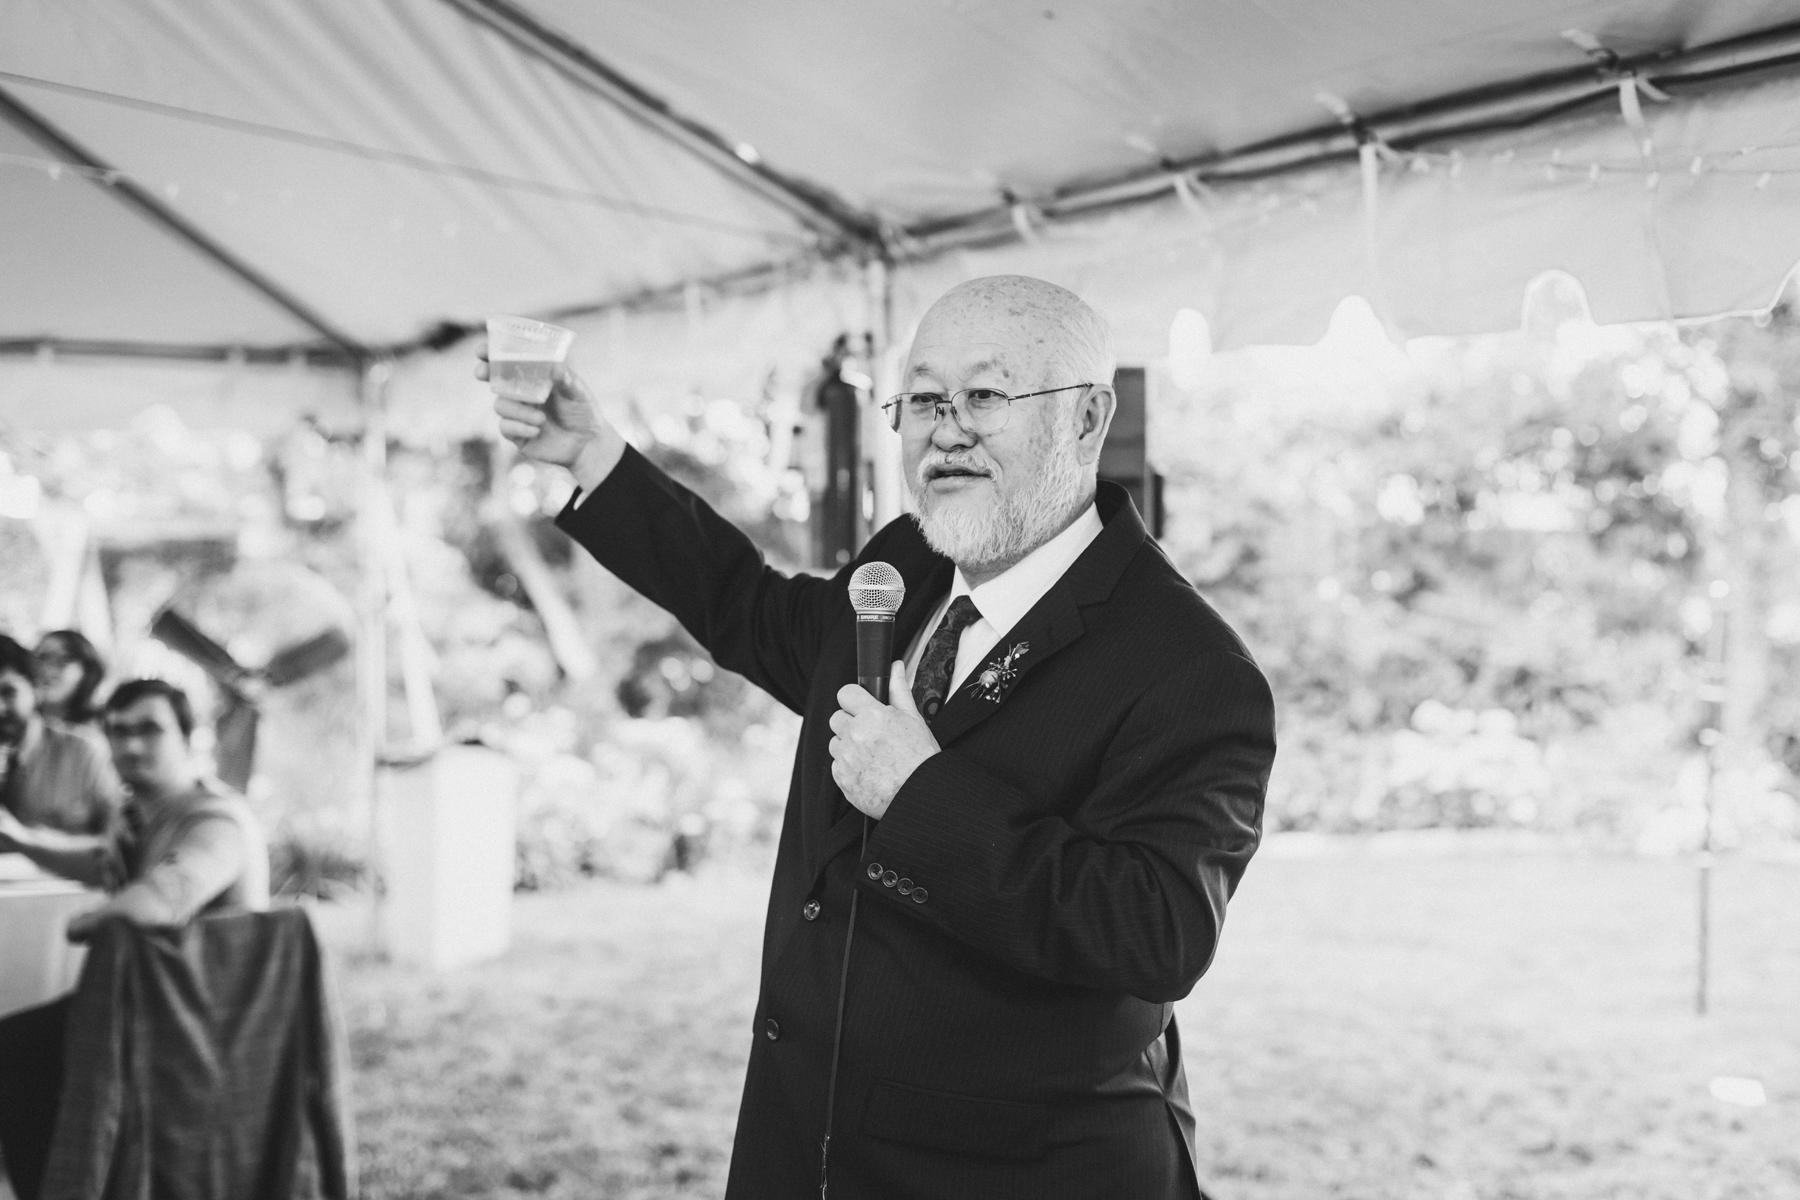 Long-Island-Documentary-Wedding-Photography-Summer-Tent-Wedding-in-New-York-127.jpg